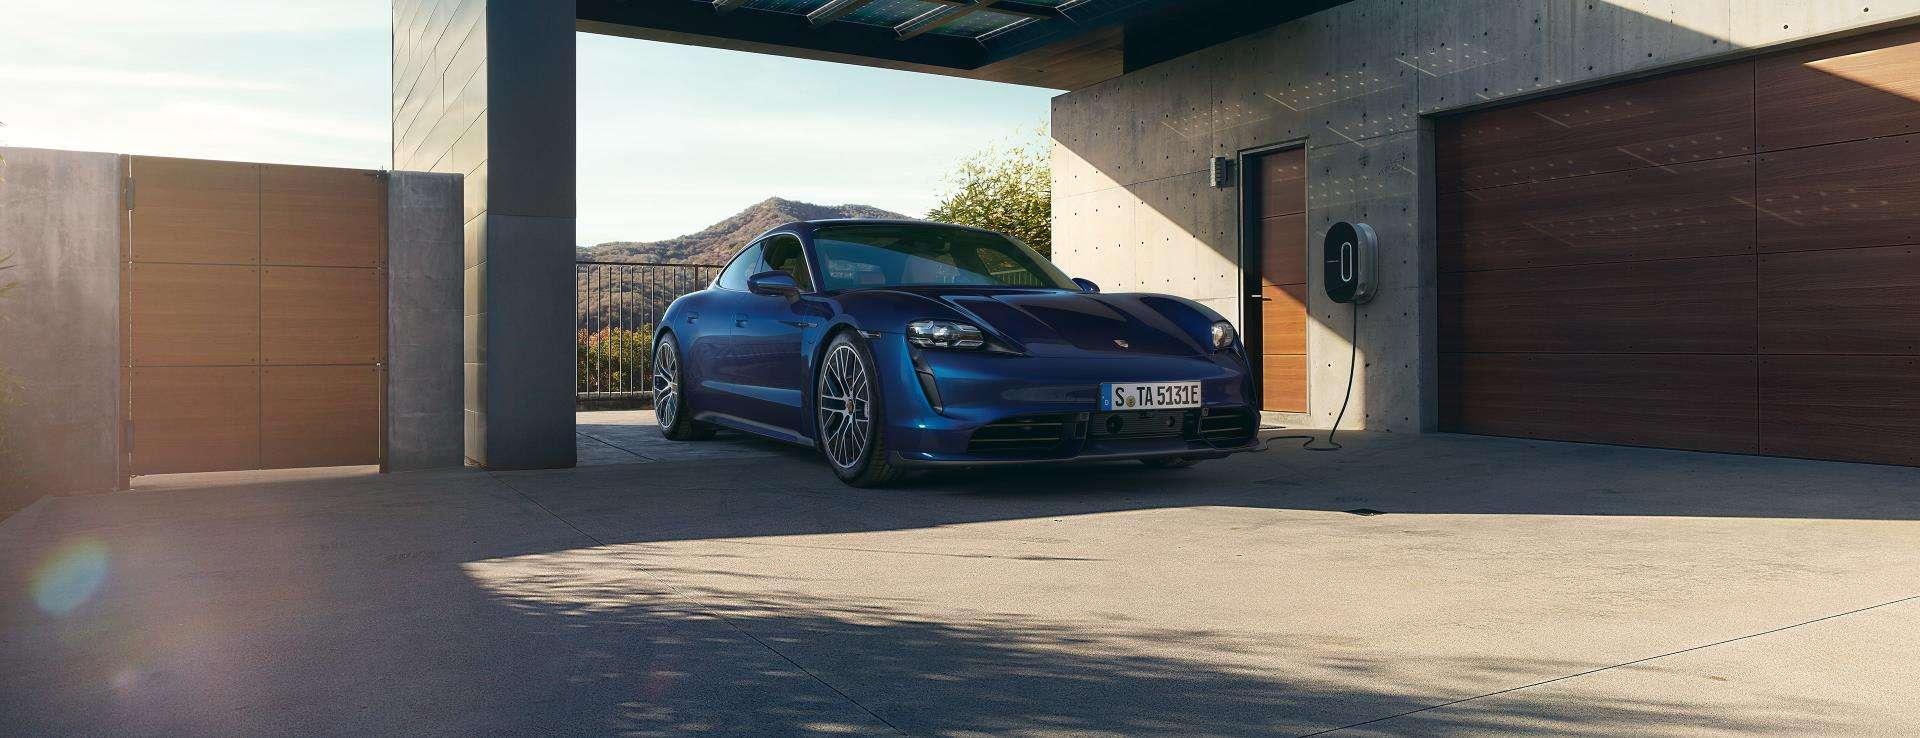 Porsche - Doğuş Oto Bursa Porsche